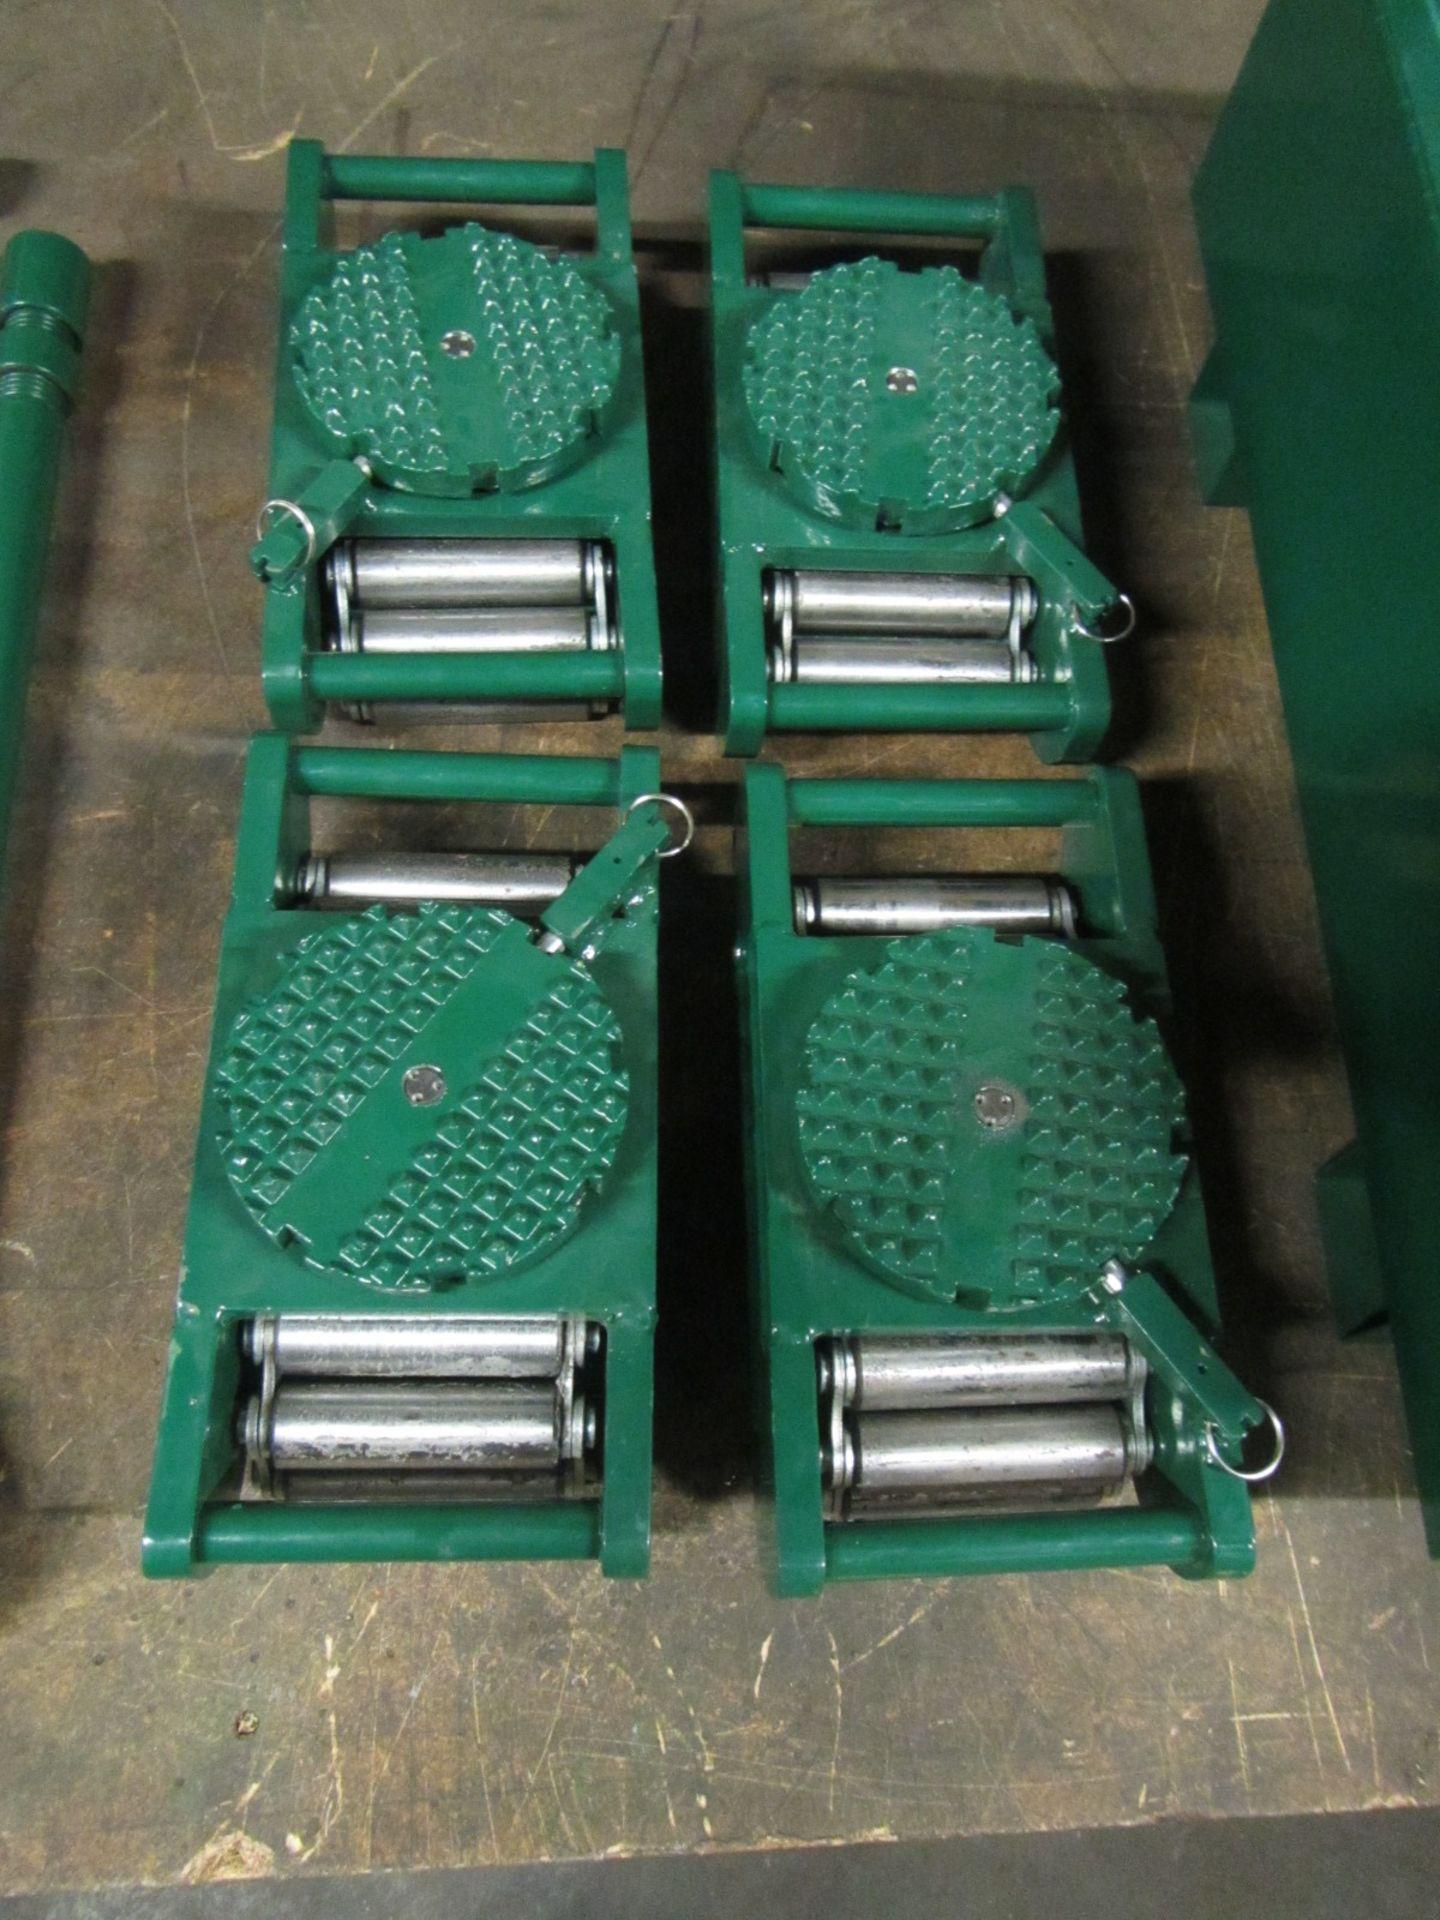 Hilman Type Roller Set Machinery moving skates - 60 Ton Deluxe Kit - 4 x 15 ton units - Image 2 of 2